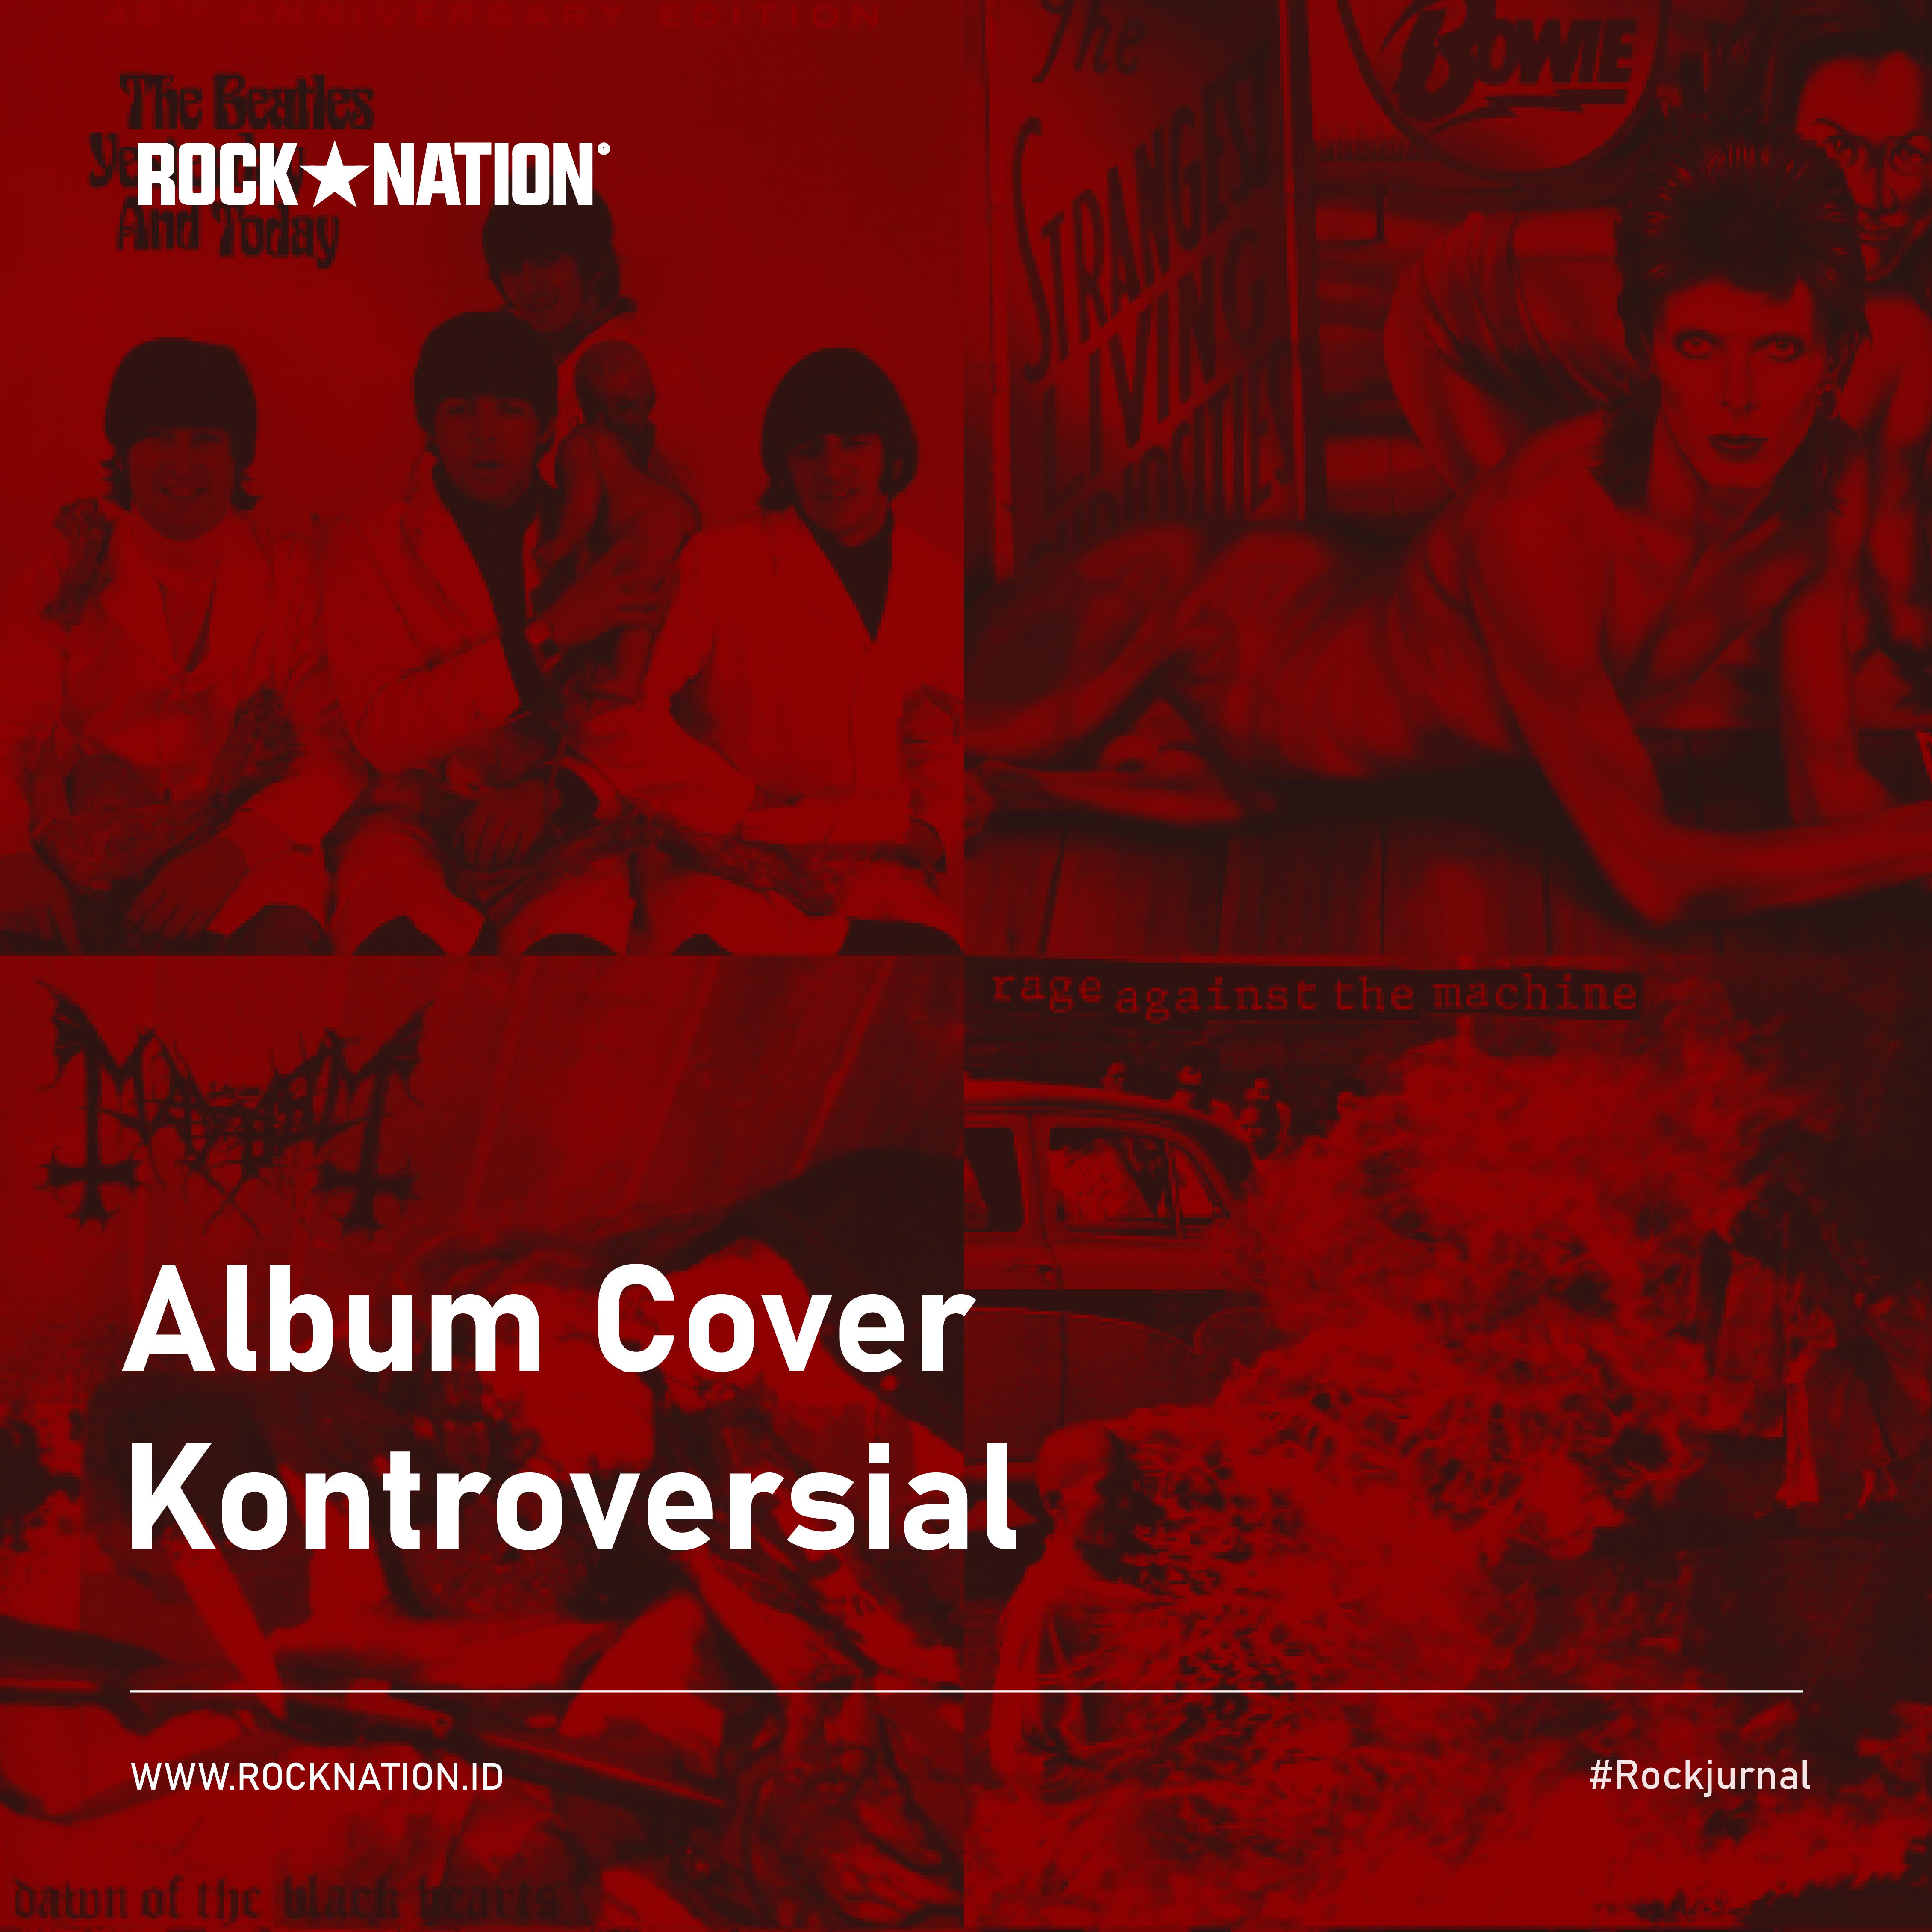 Album Cover Kontroversial image